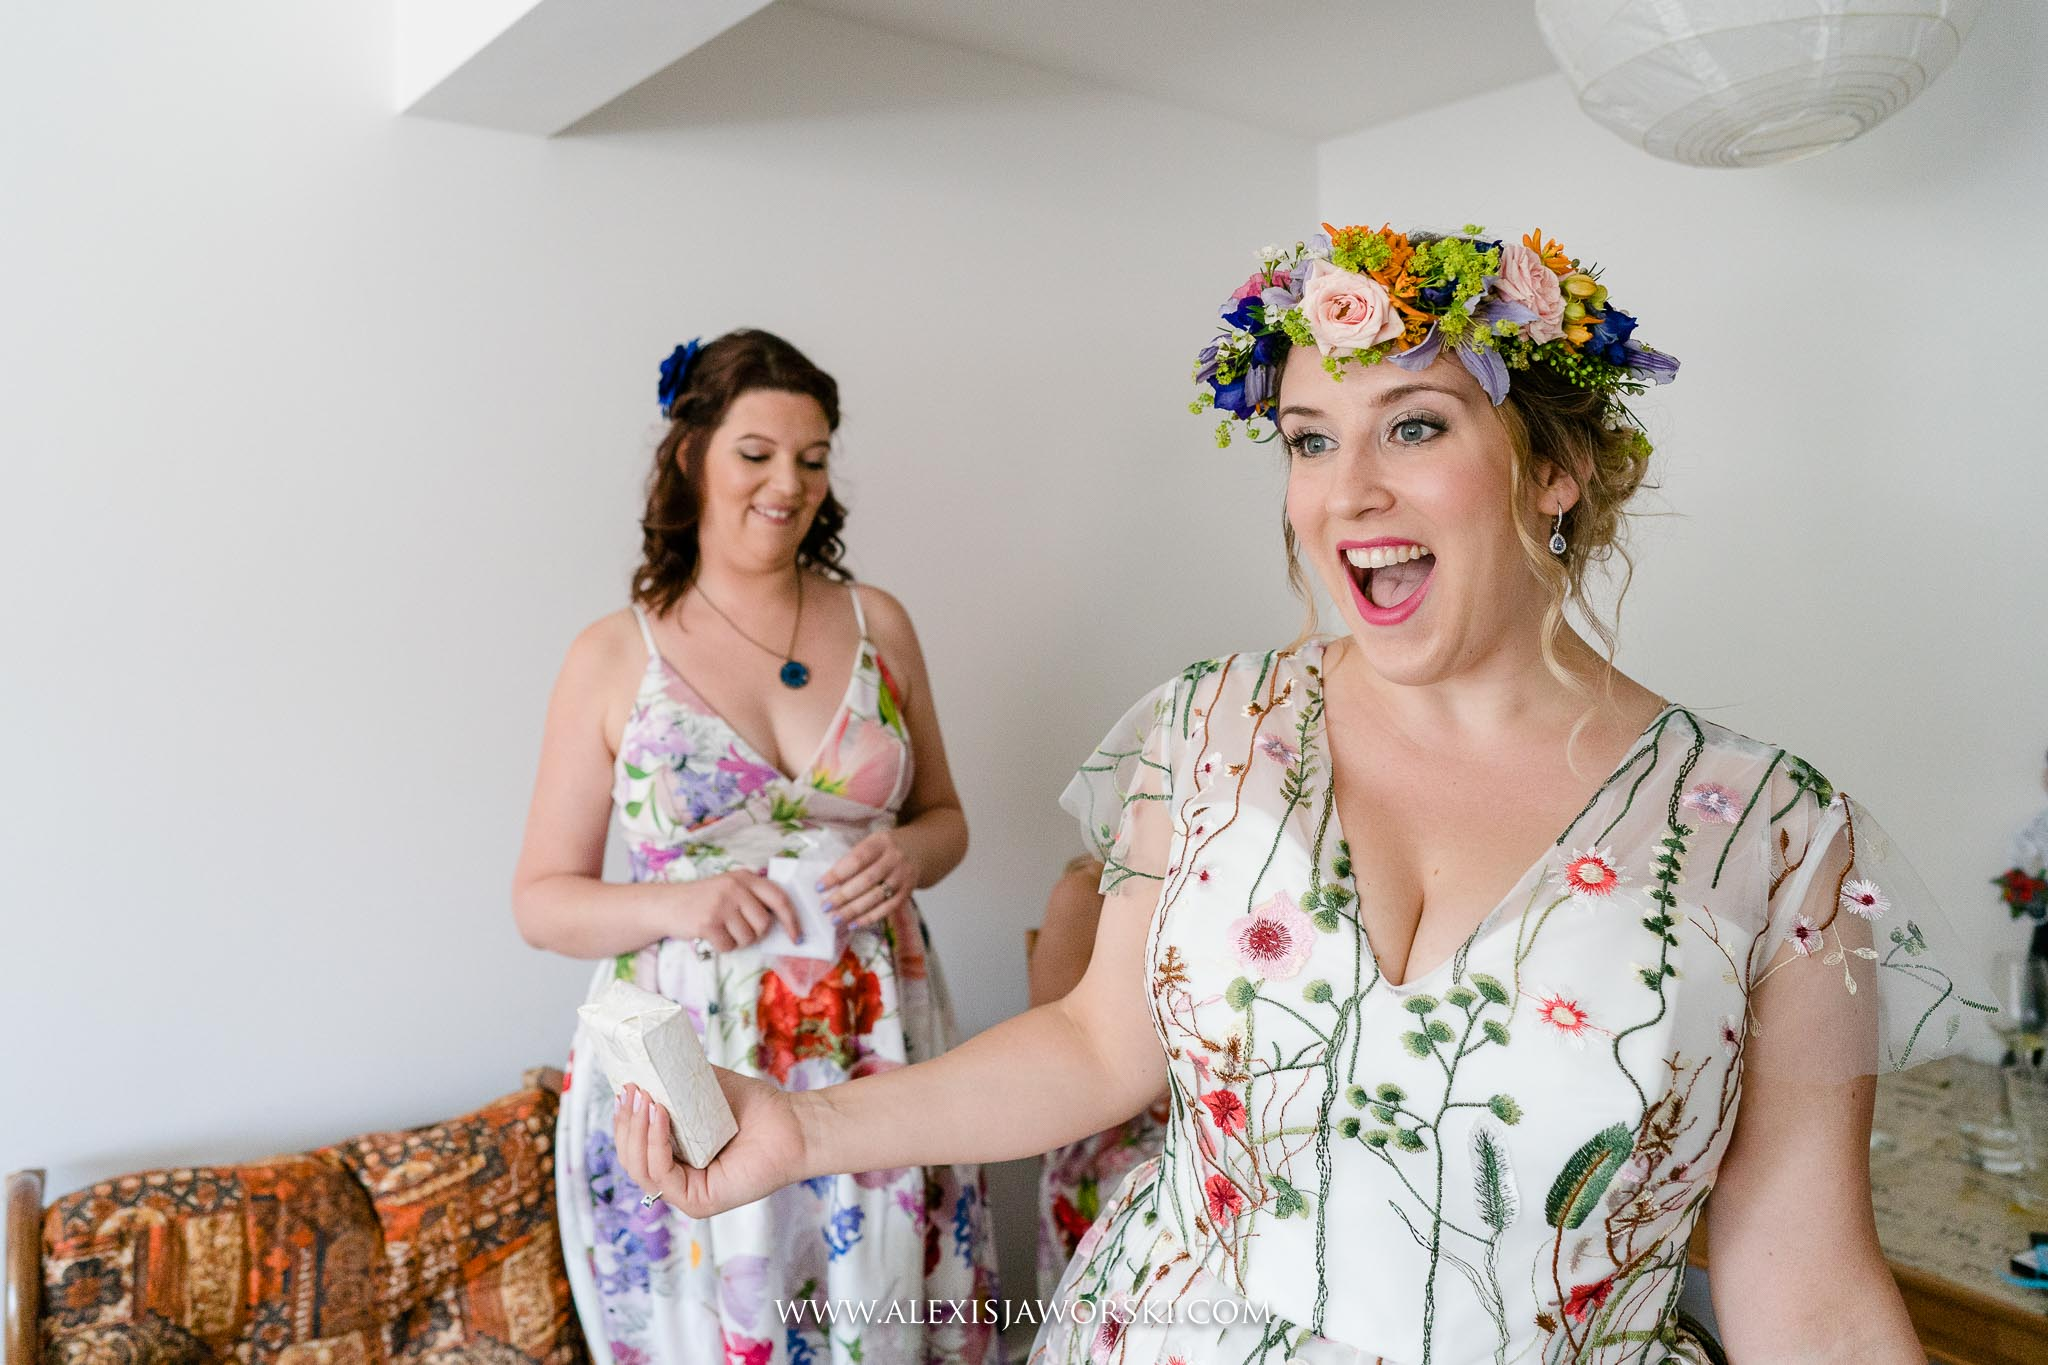 bride happy win wedding dress